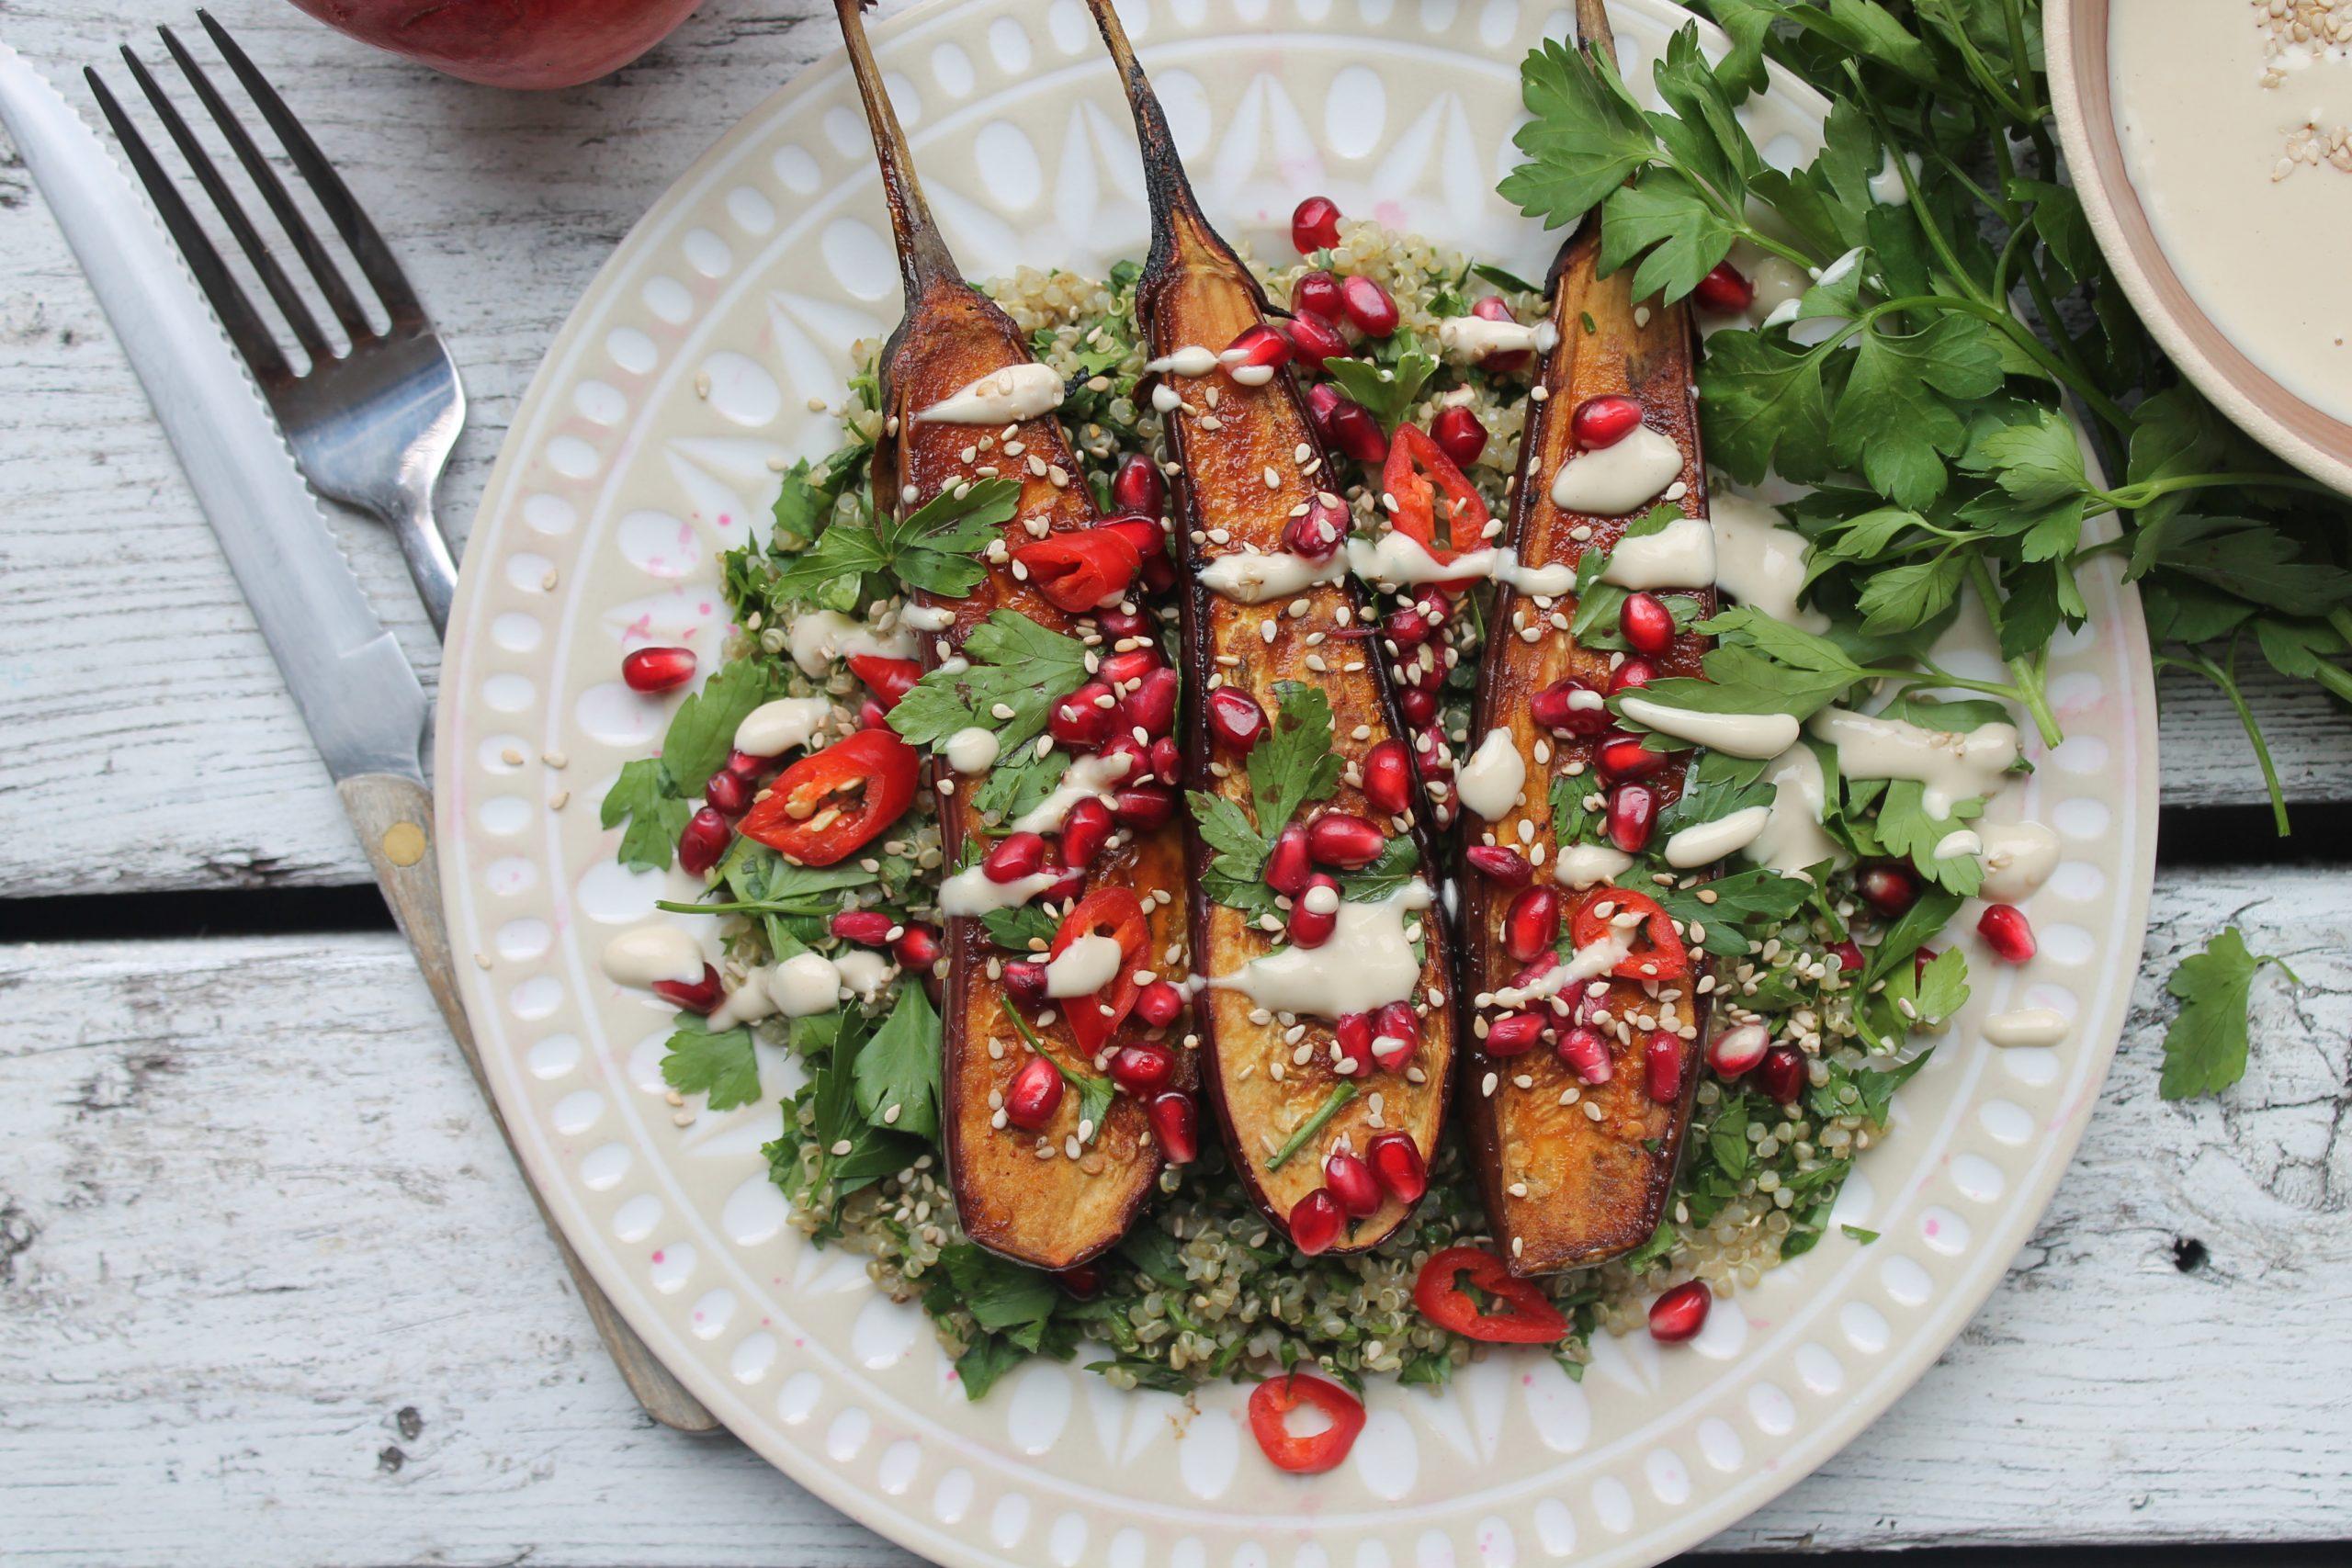 Miso glazed aubergines with quinoa tabbouleh